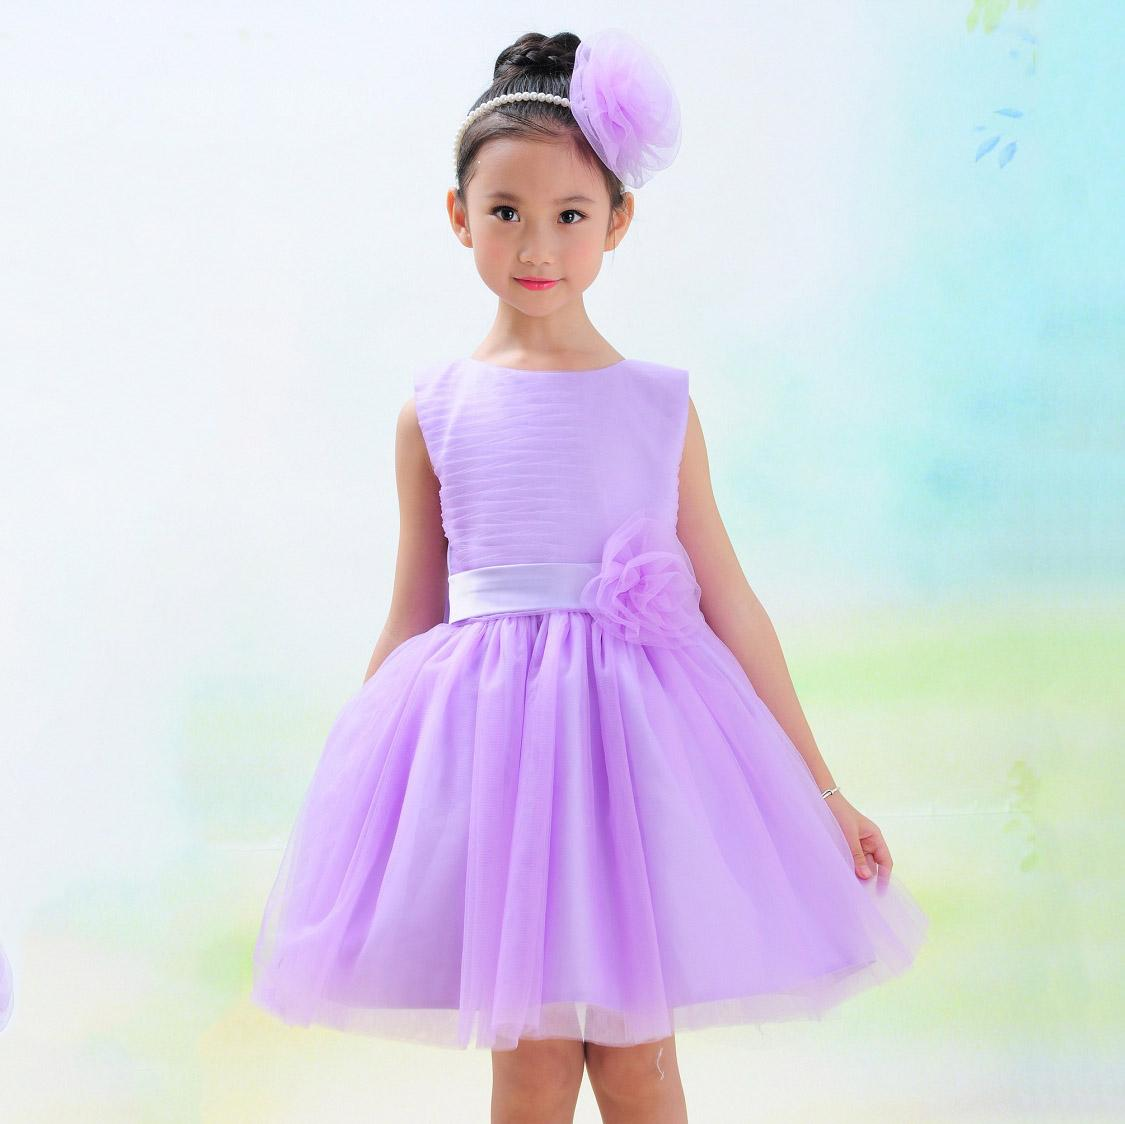 Atractivo Próximos Niñas Vestidos De Fiesta Elaboración - Ideas de ...